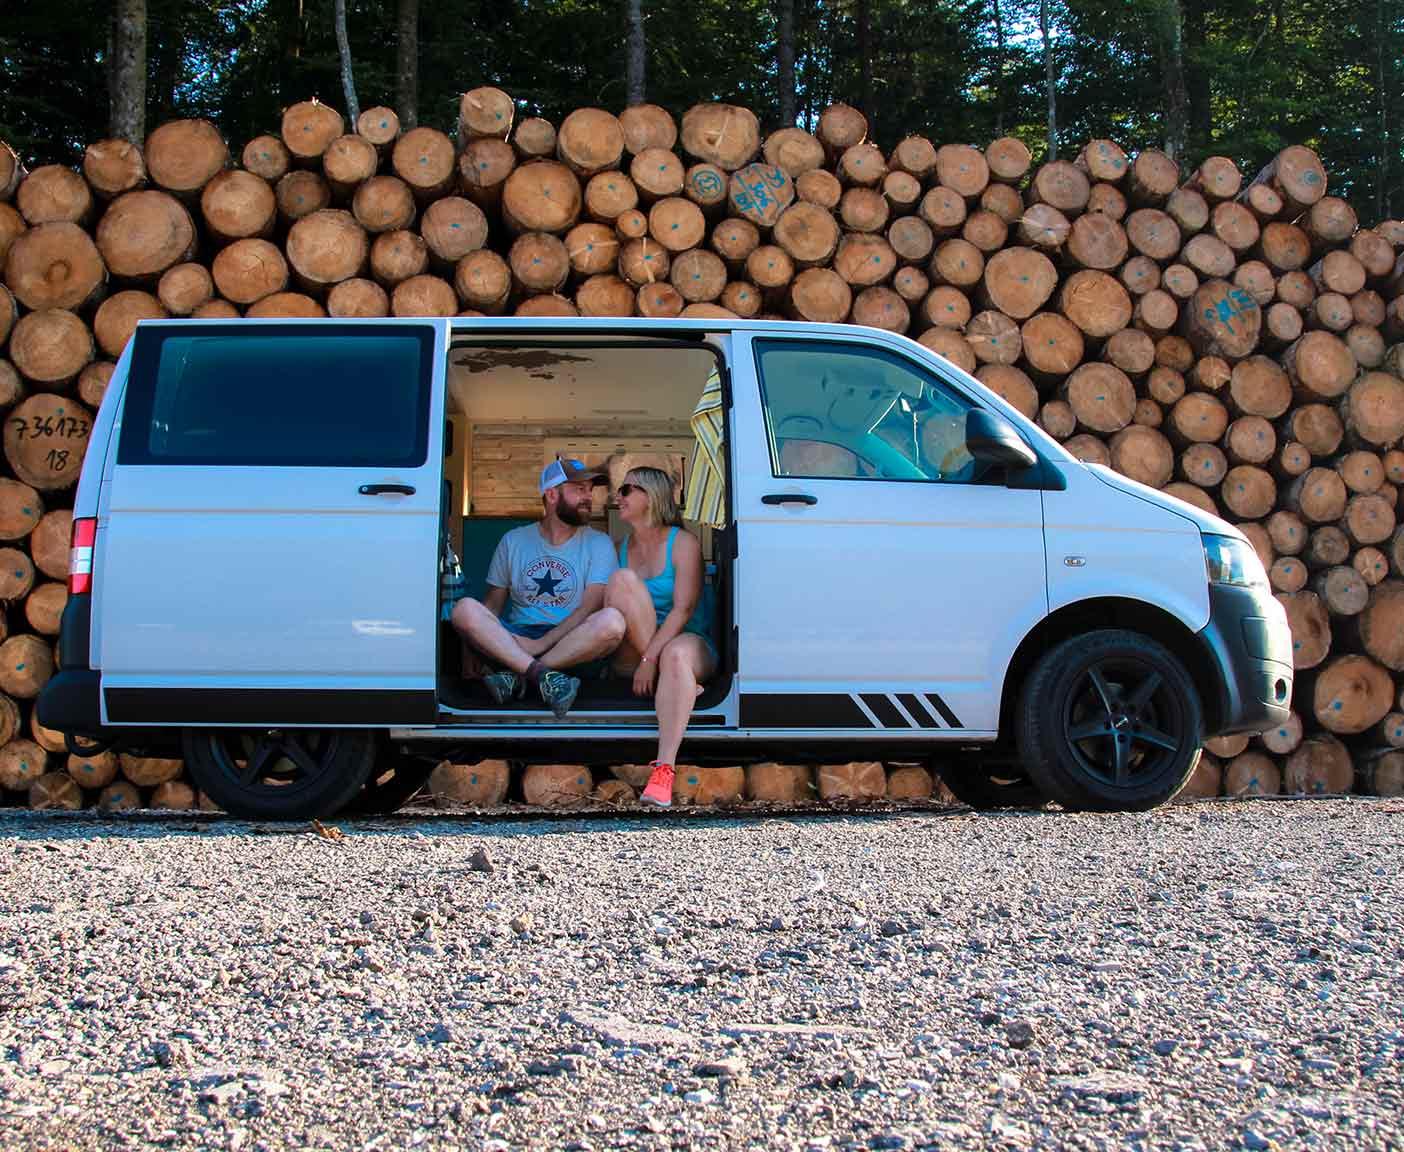 VW-T5-multivan-camper-caravelle-europatrip-van-sabbatical-selbstausbau